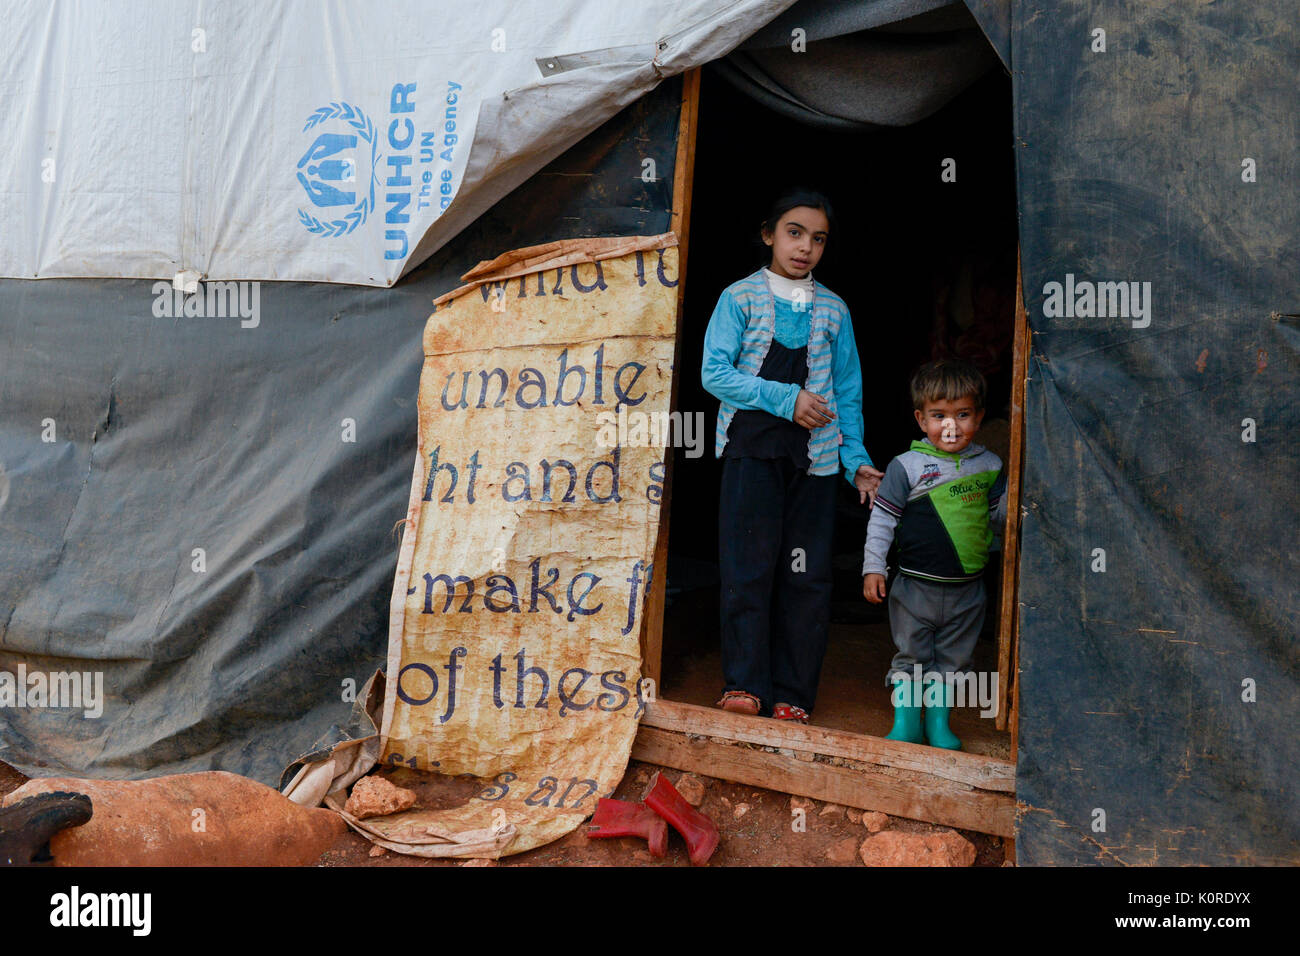 LEBANON Deir el Ahmad, a maronite christian village in Beqaa valley, syrian refugee camp / LIBANON Deir el Ahmad, ein christlich maronitisches Dorf in der Bekaa Ebene, Camp fuer syrische Fluechtlinge - Stock Image